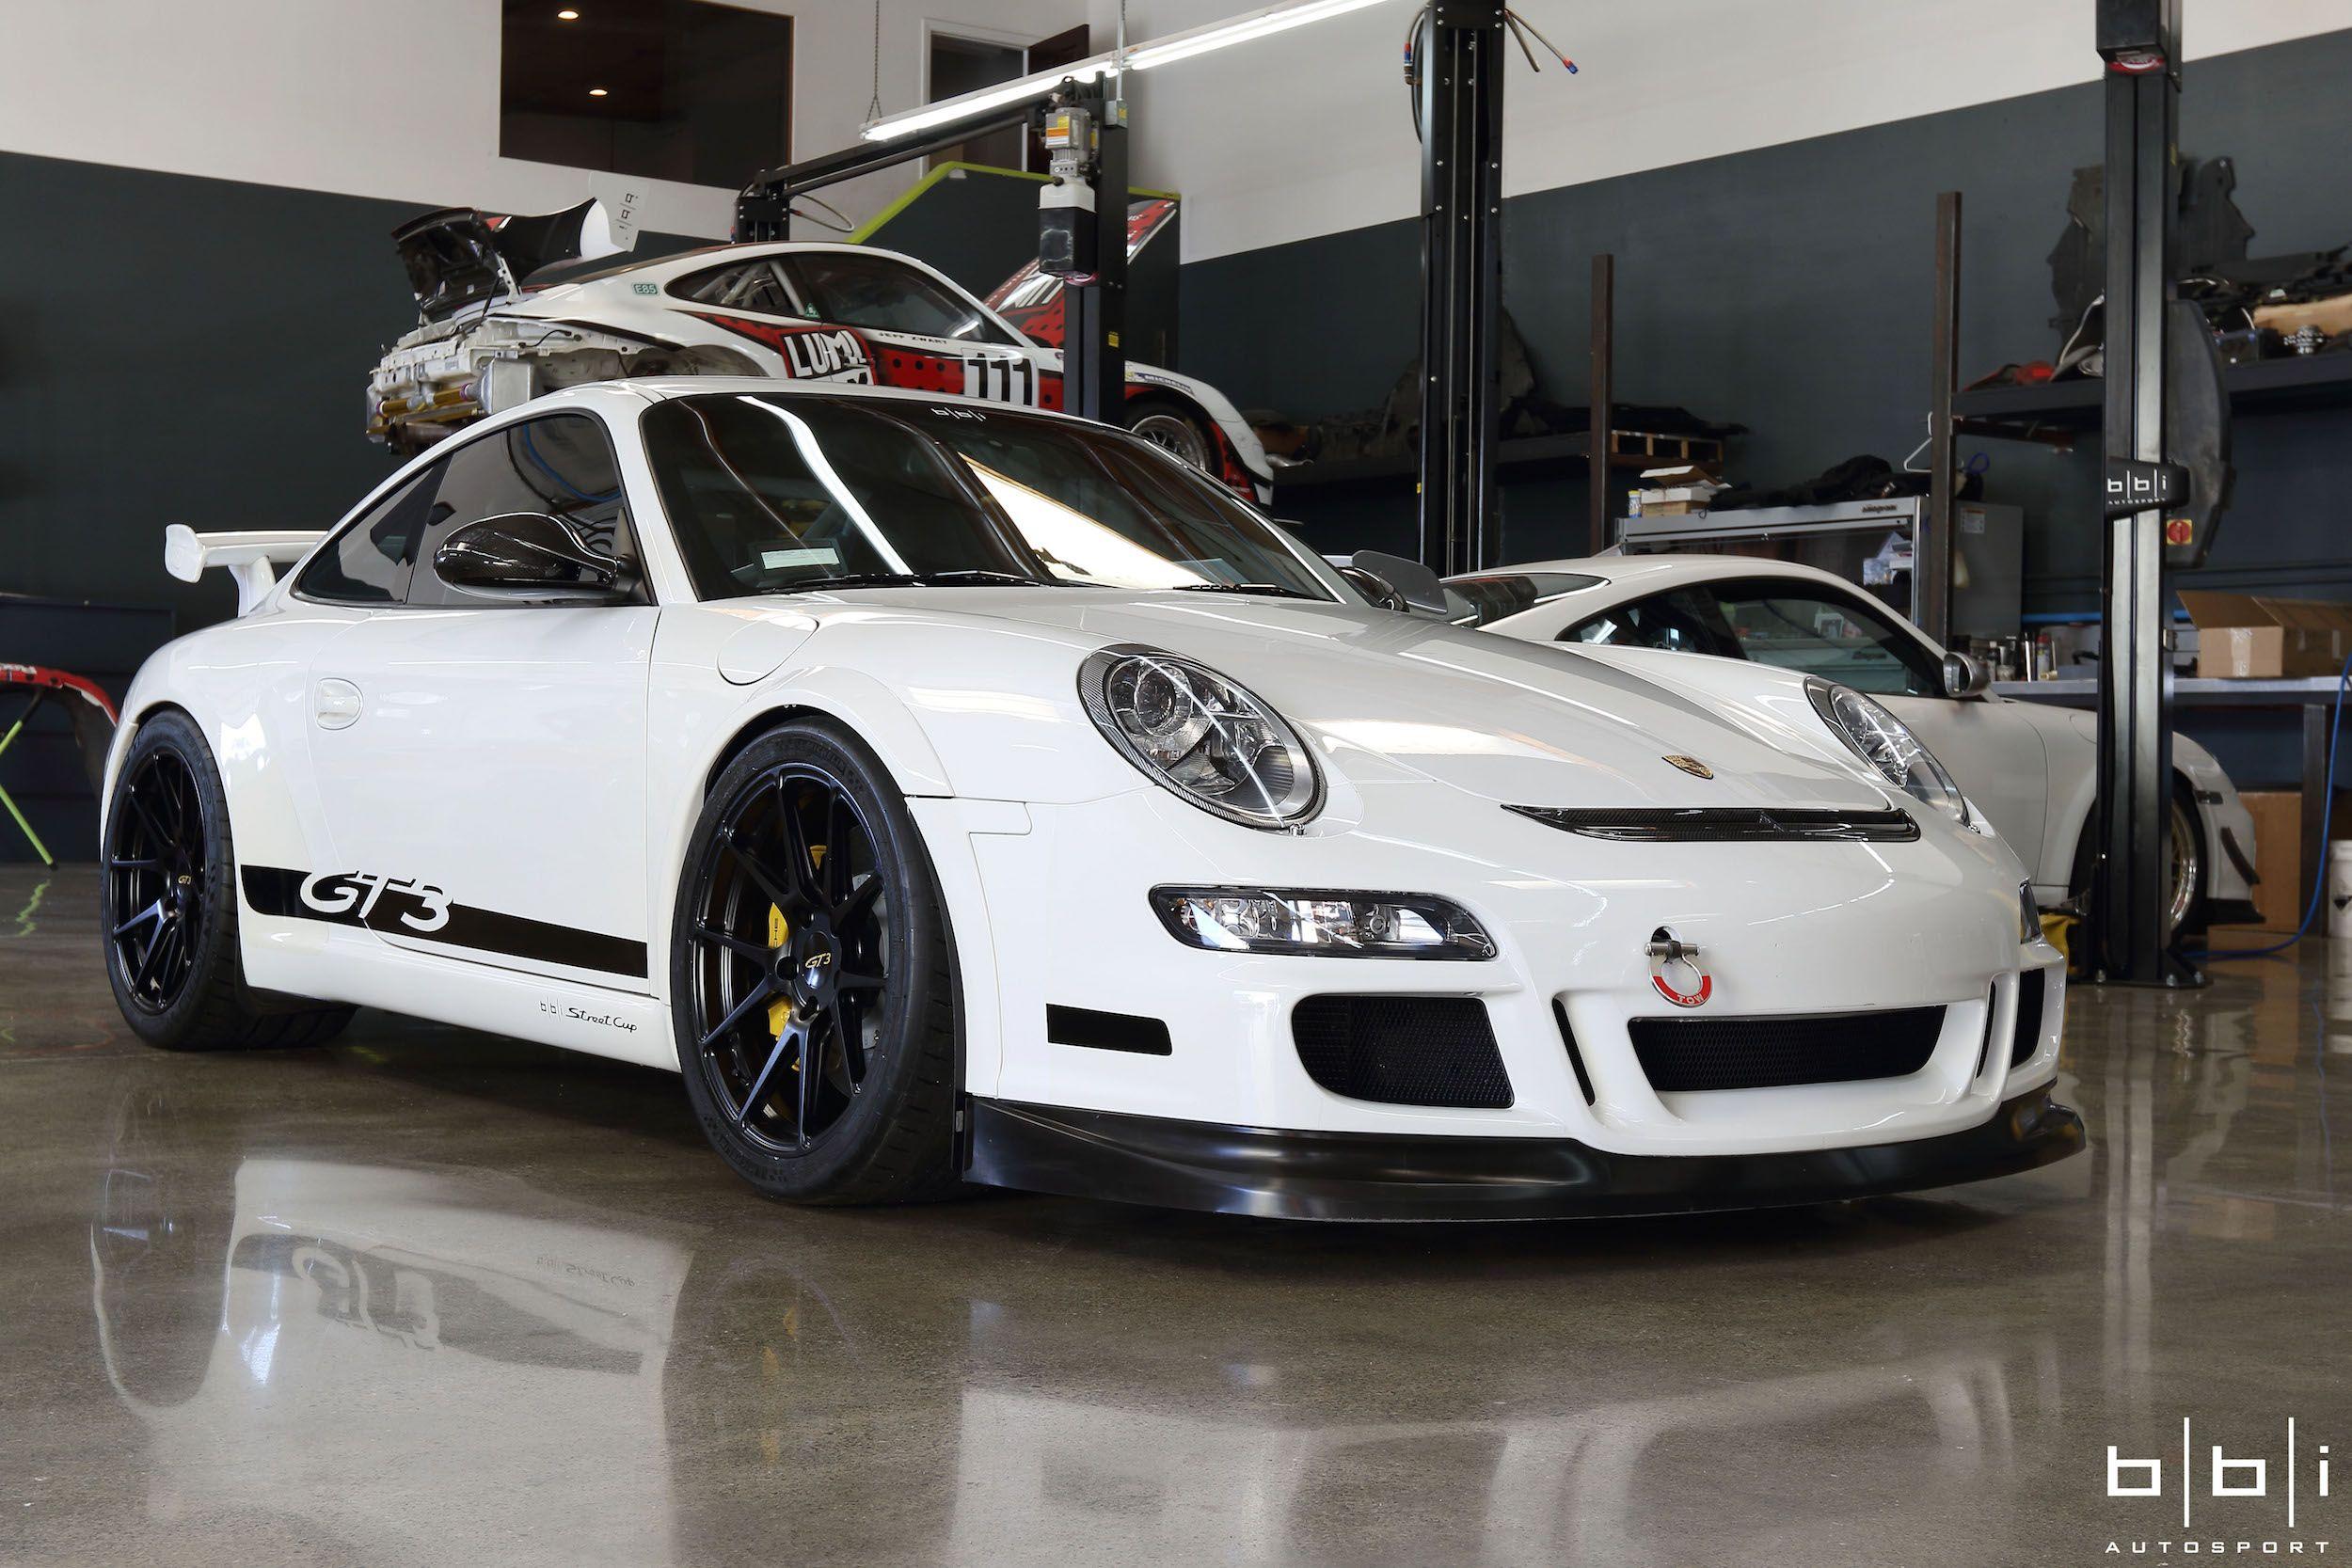 Porsche 911 Project Bull Dog By BBi Autosport